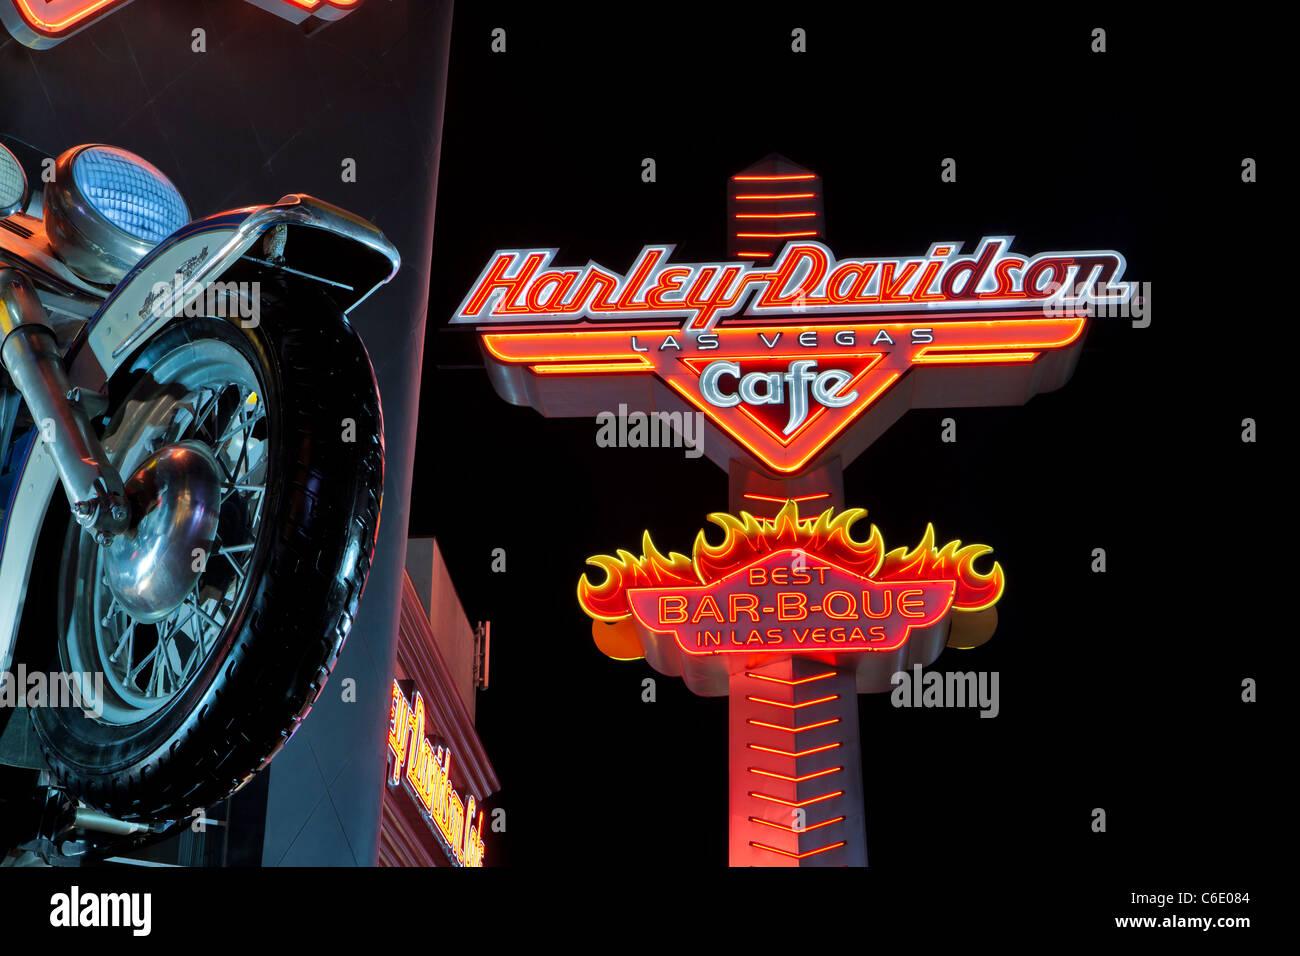 Harley Davidson cafe on Las Vegas Blvd. at night-Las Vegas, Nevada, USA. - Stock Image